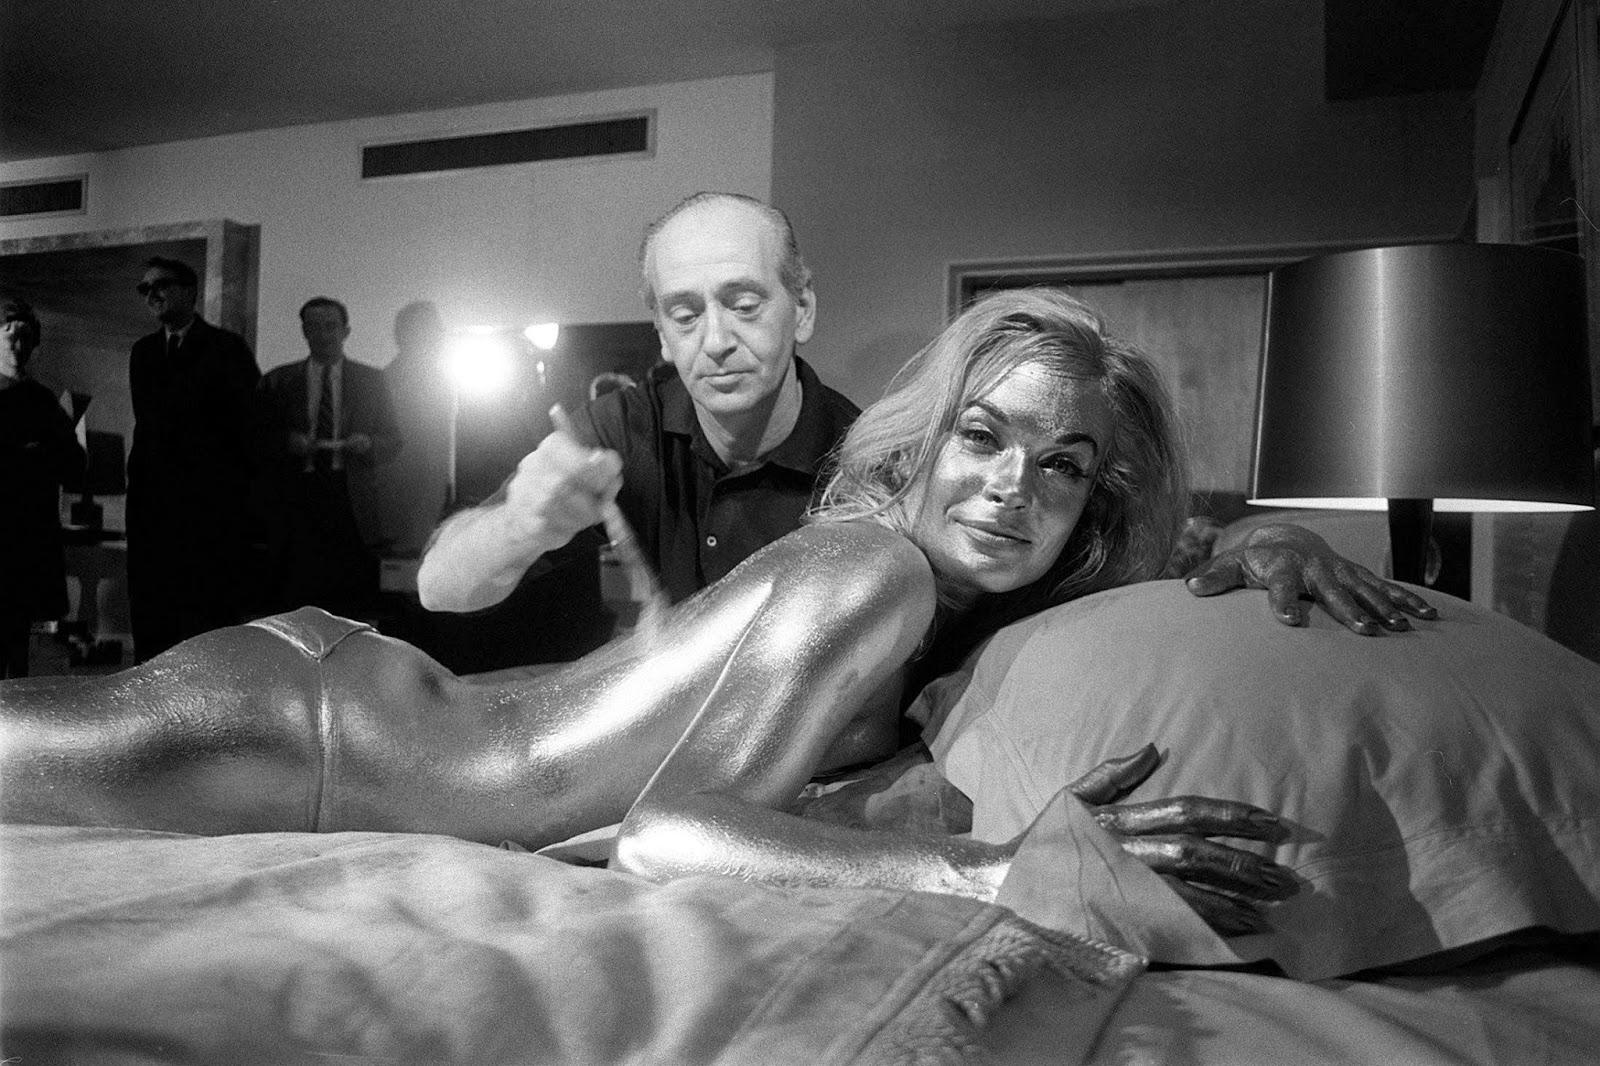 nude blackman nude white woman nude hegre art